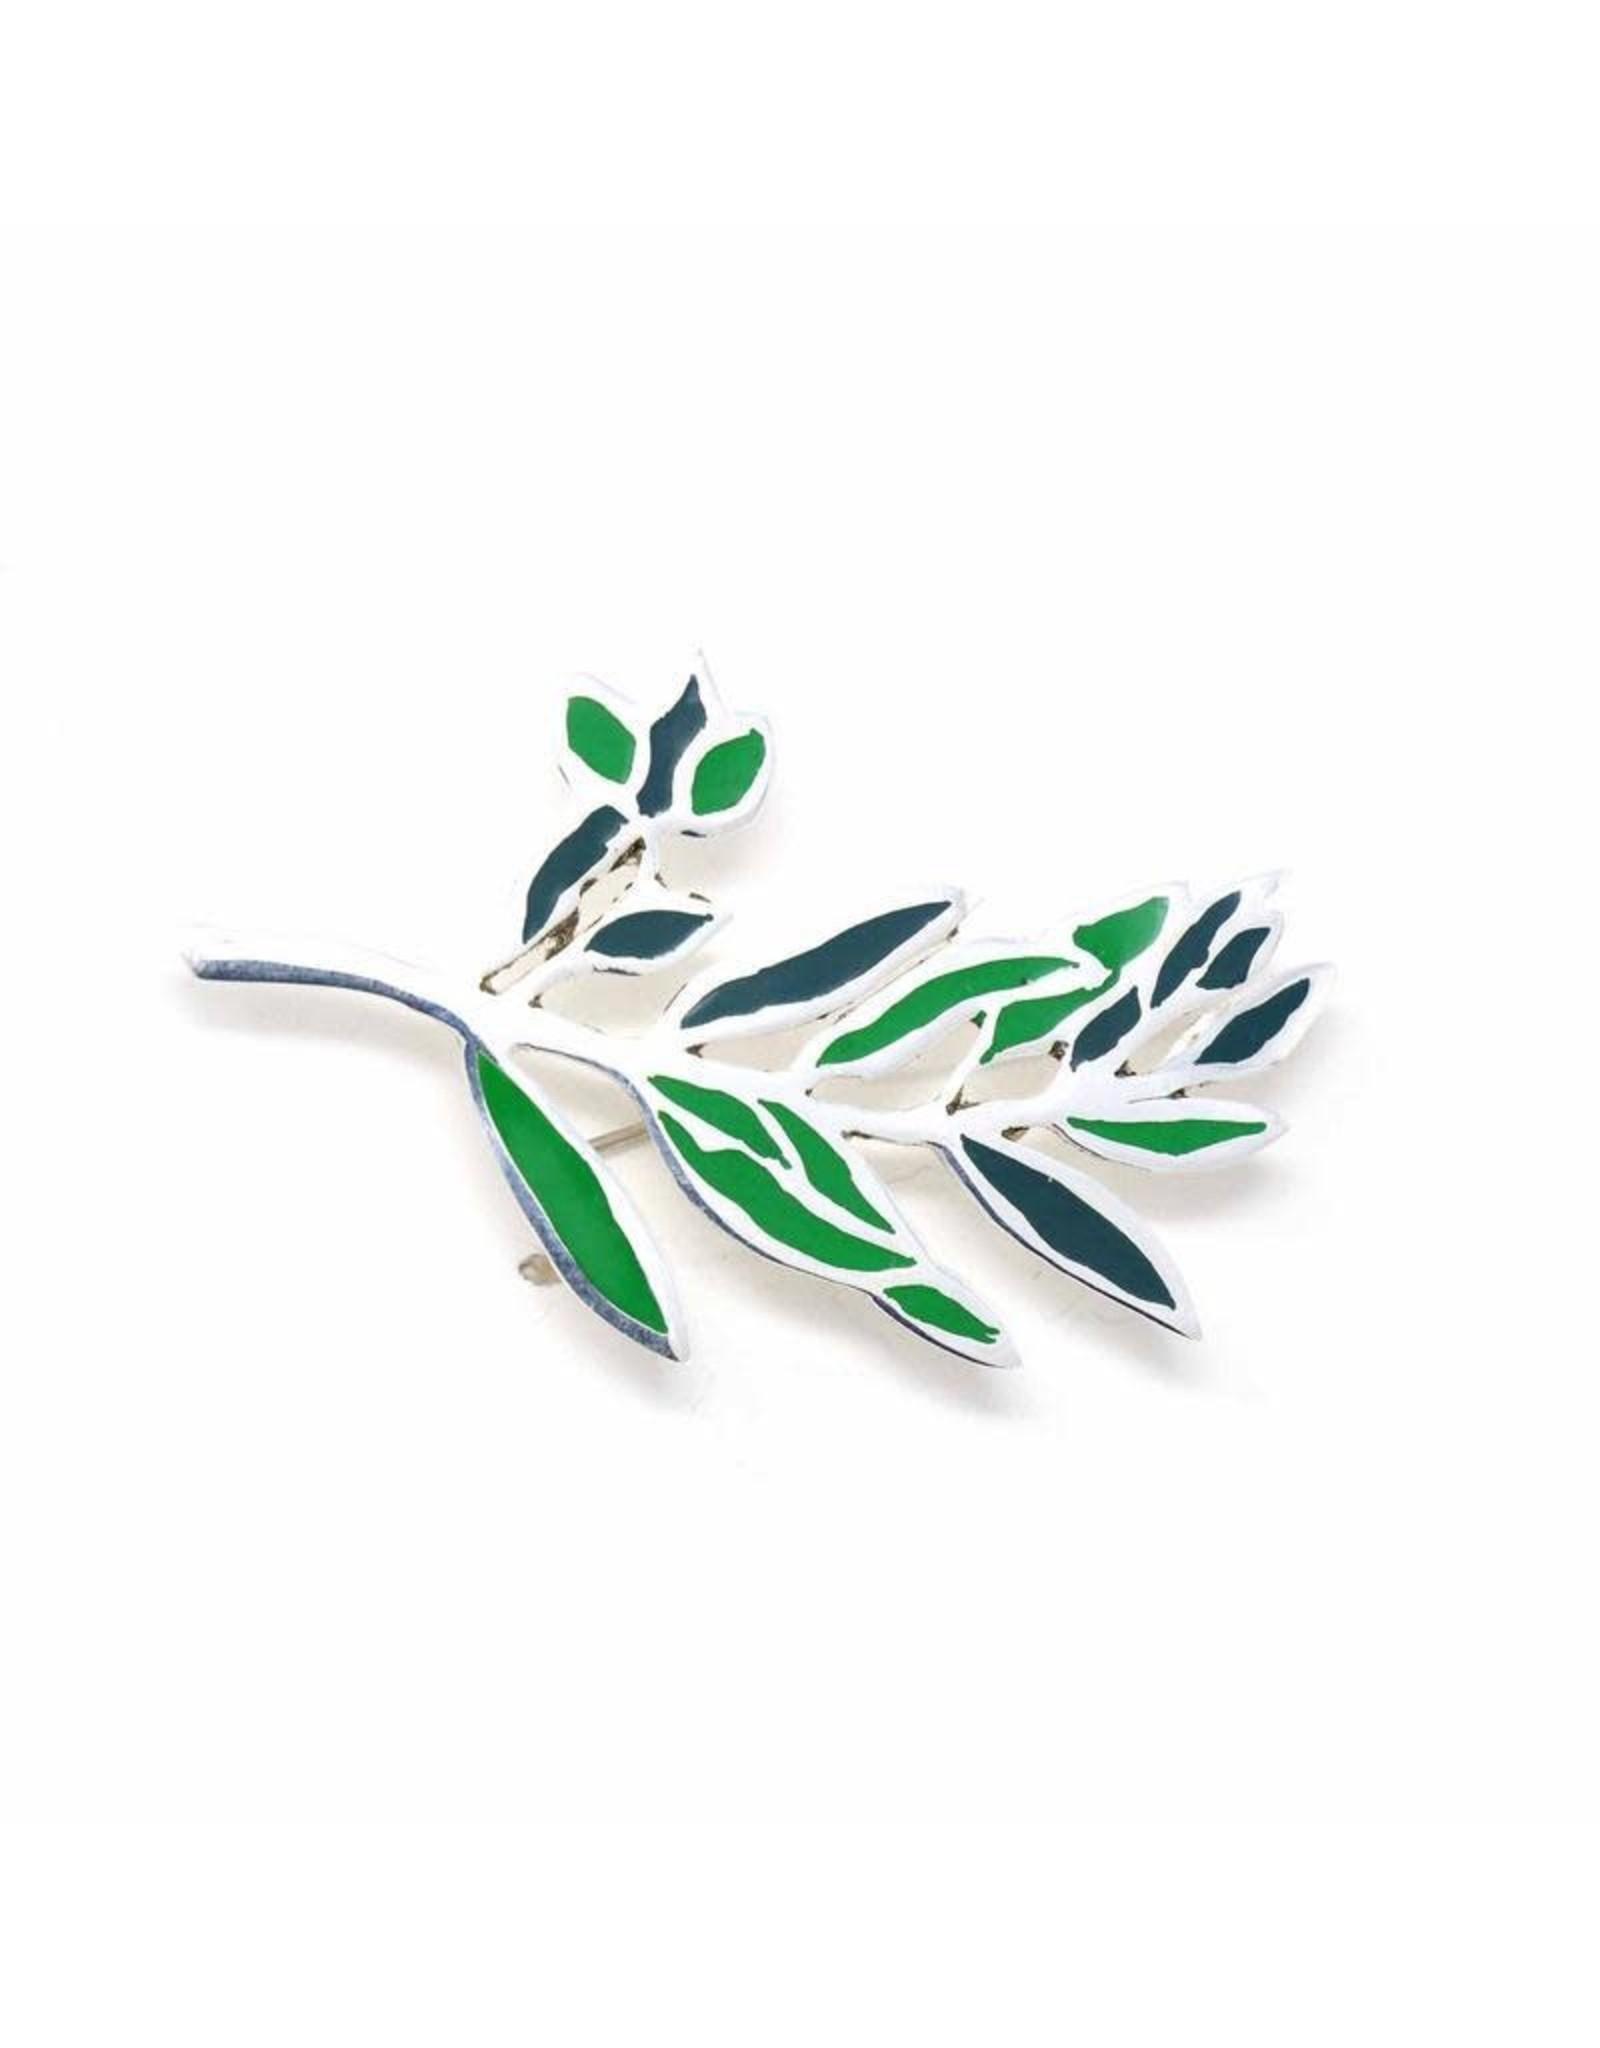 Silver Plated Branch Brooch